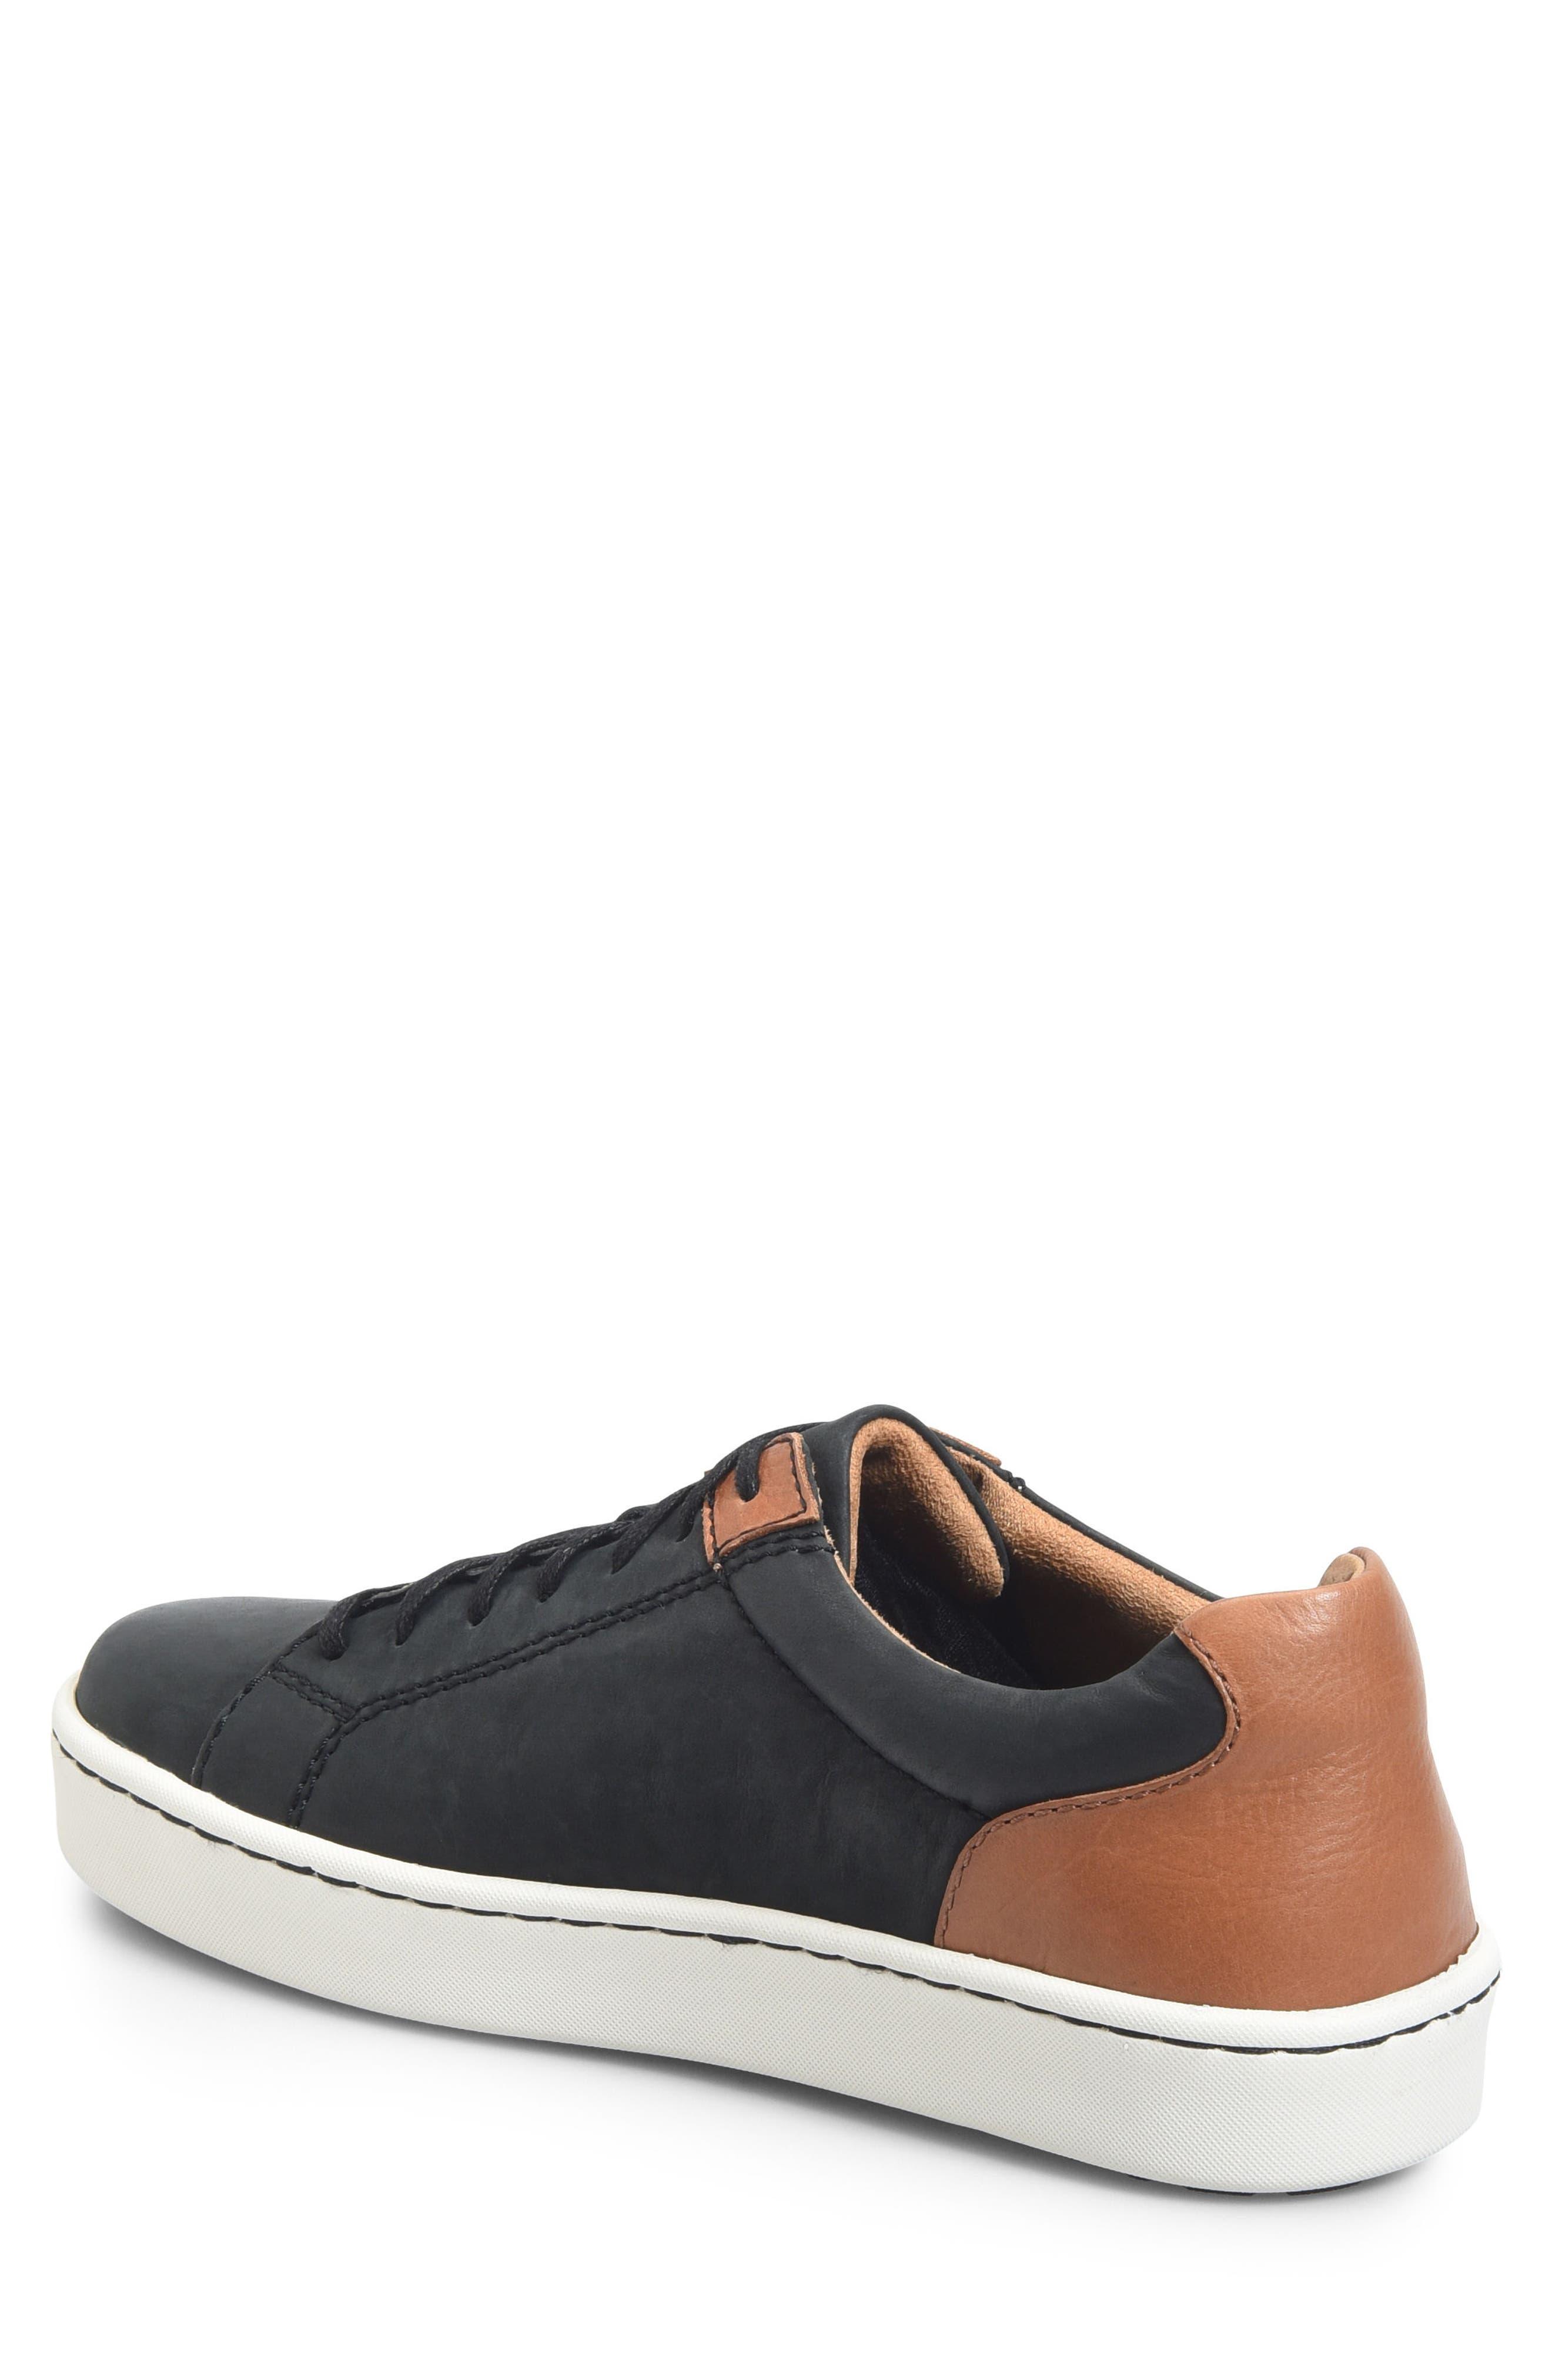 Jib Sneaker,                             Alternate thumbnail 2, color,                             001